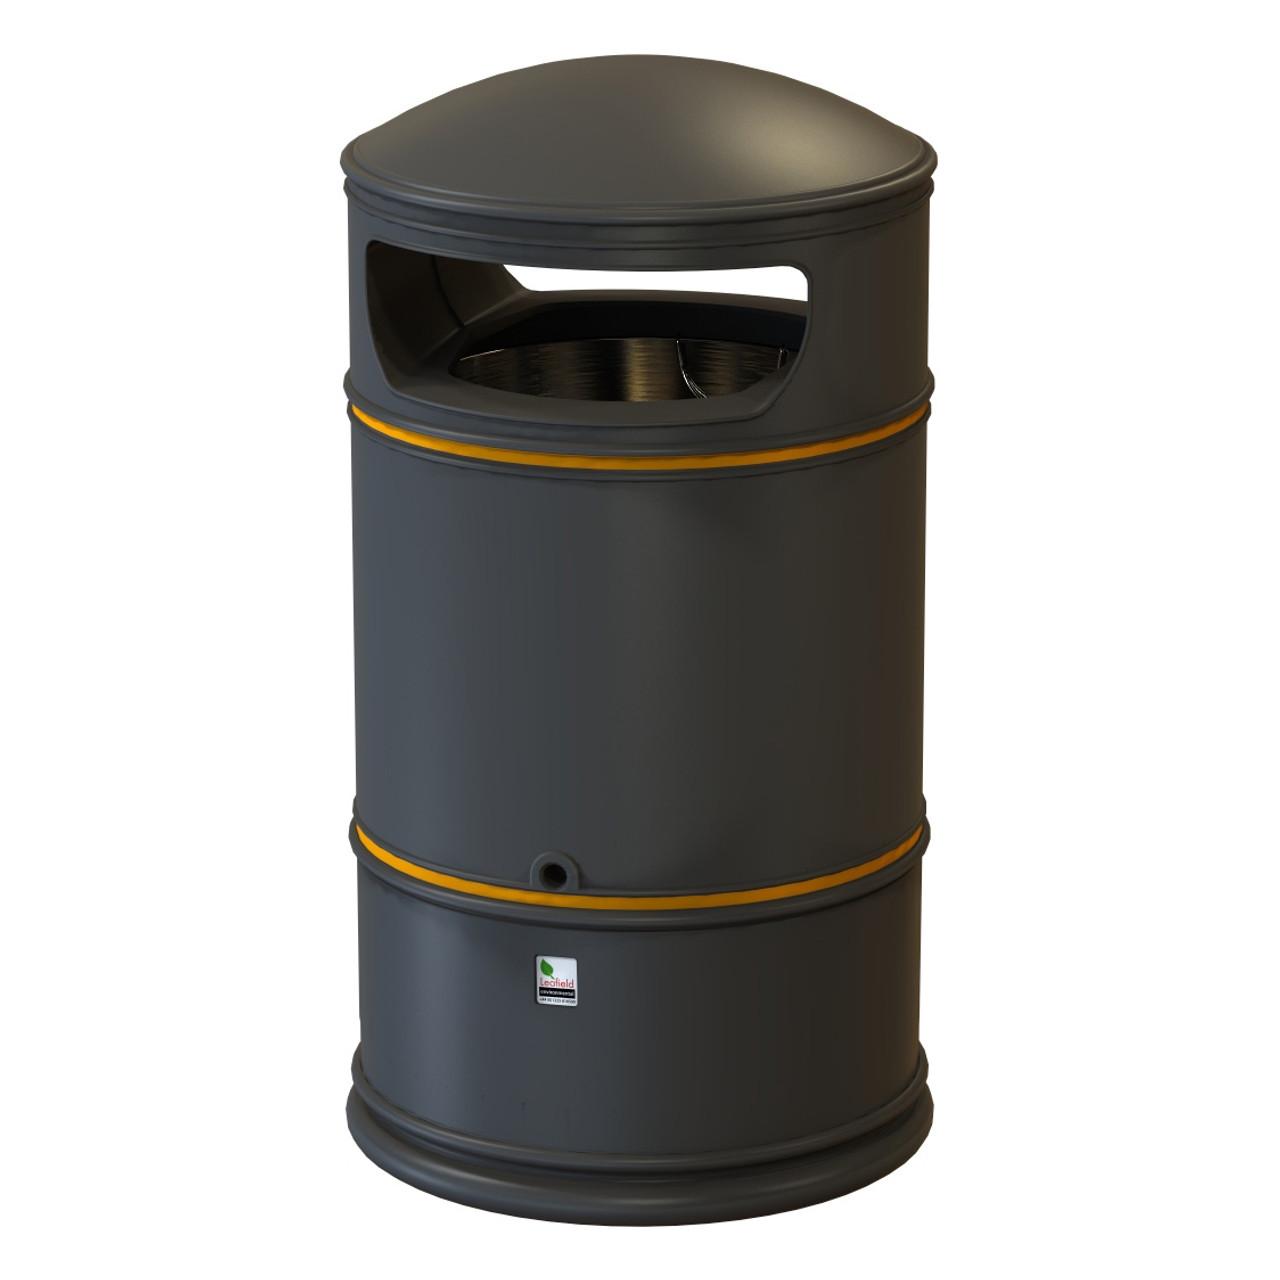 Classic Heritage litter bin 110 litre black